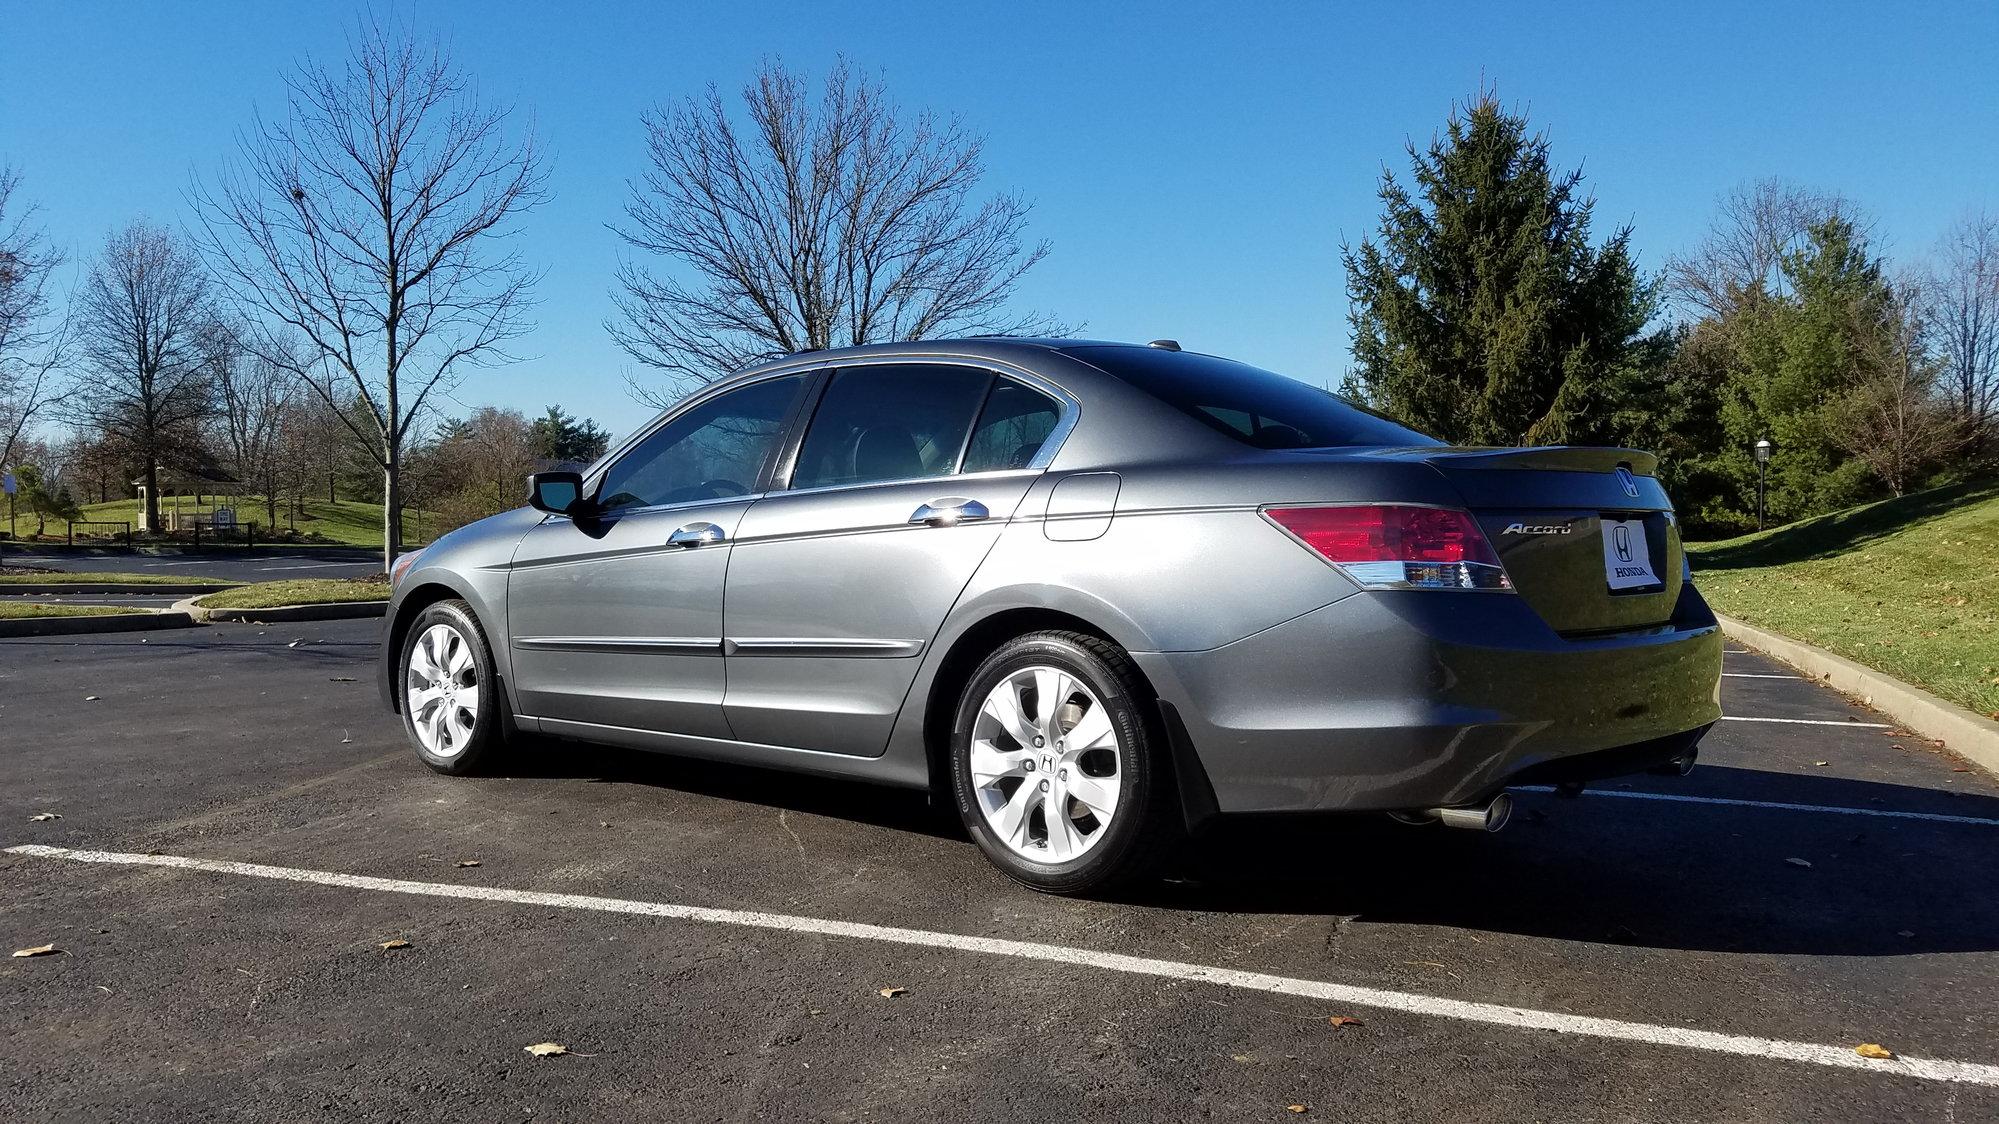 OH For Sale in Dayton, Ohio: 2008 Honda Accord EX-L V6 ...